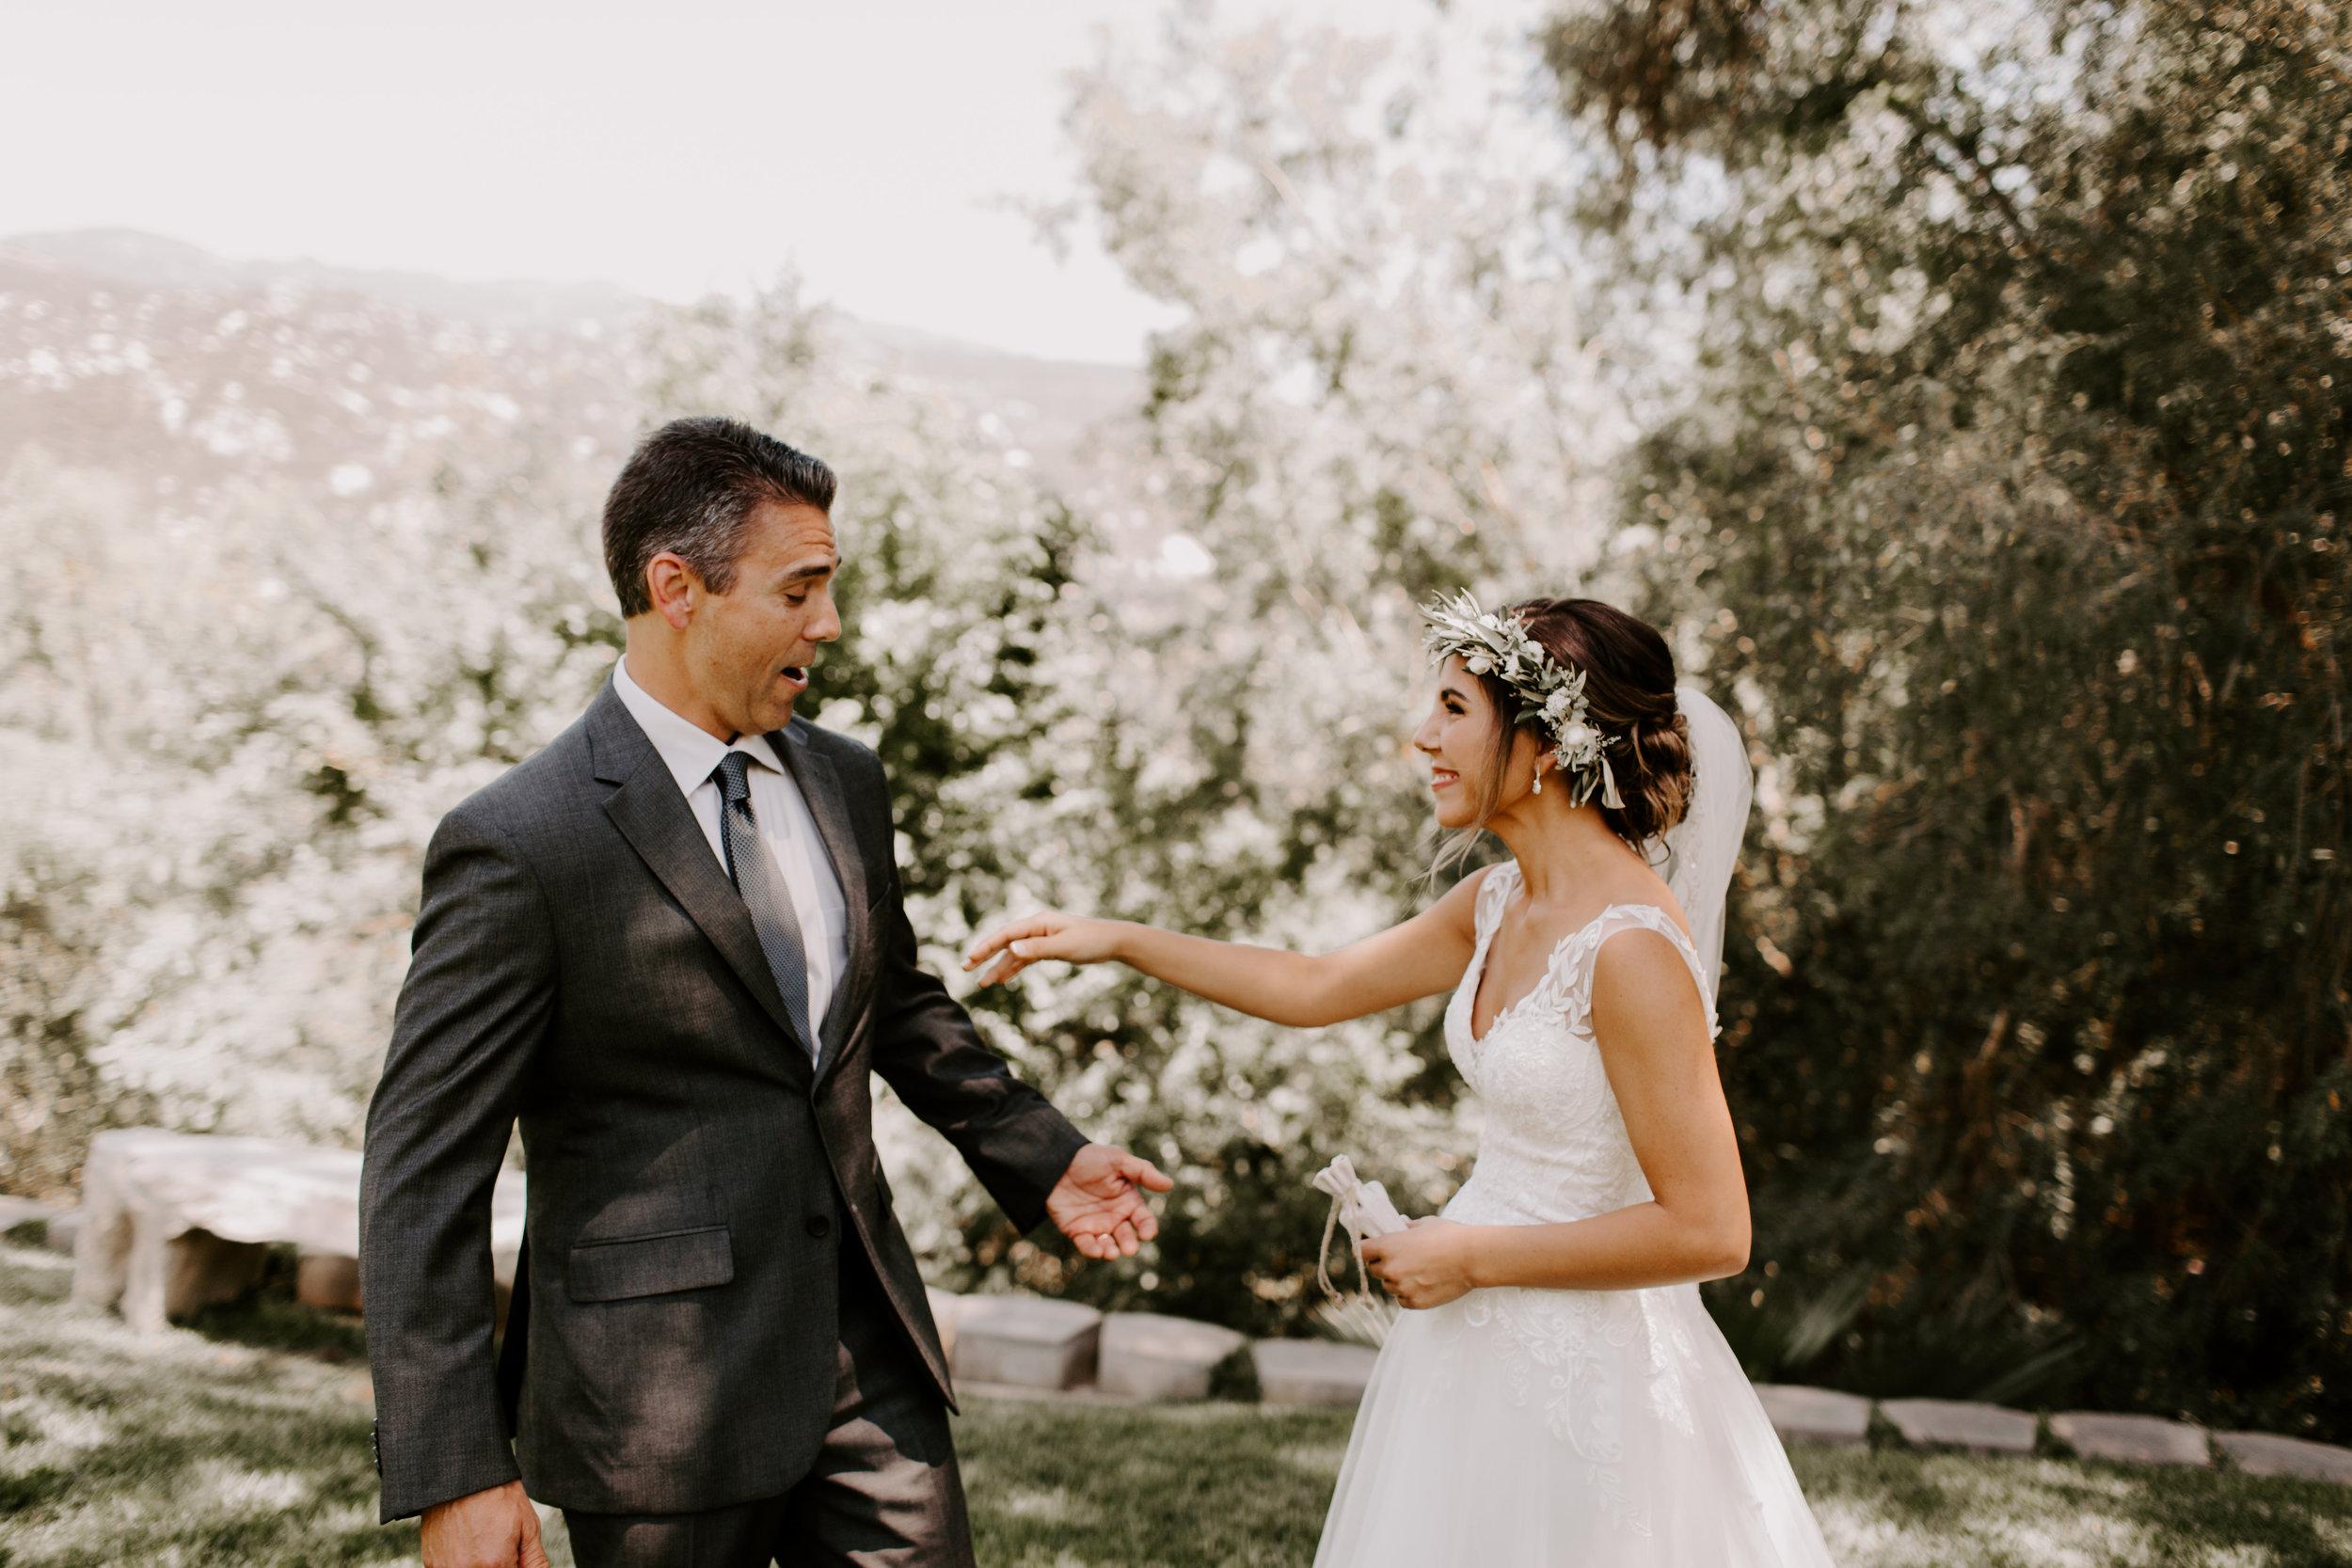 kate+zack_wedding_secludedgardenestate_temecula_madisonrylee_0139.jpg